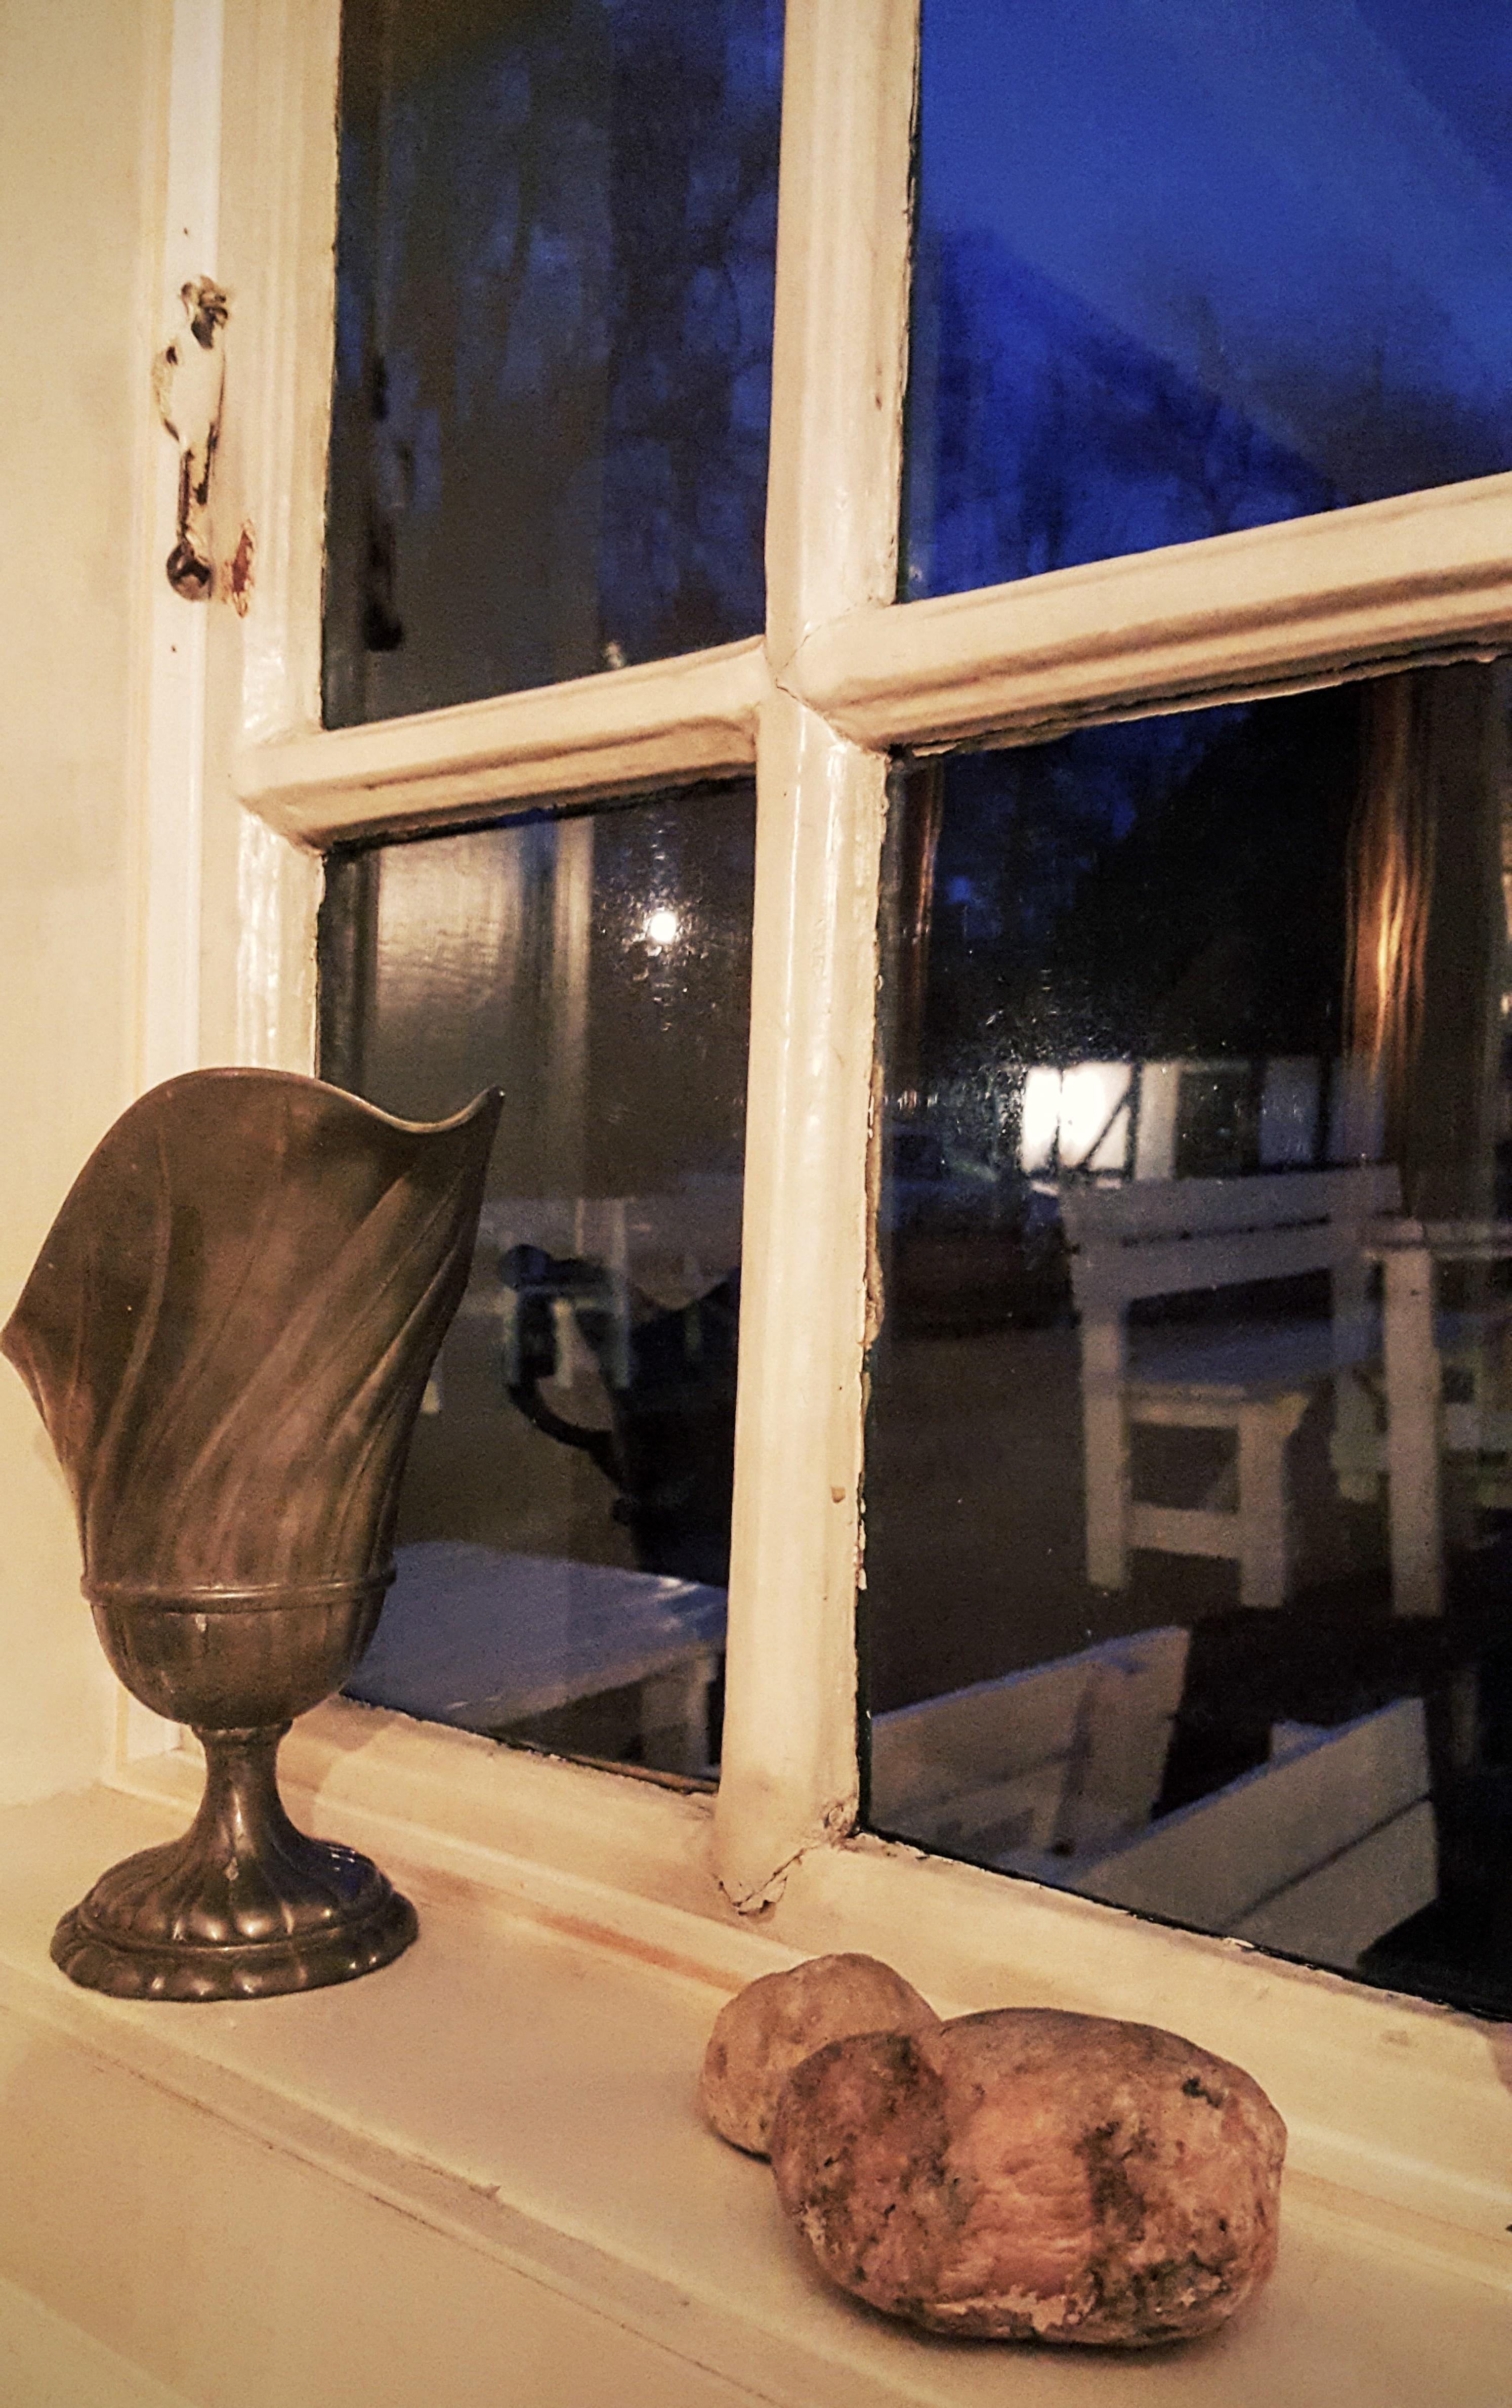 Rustikke genstand i vindueskarmen